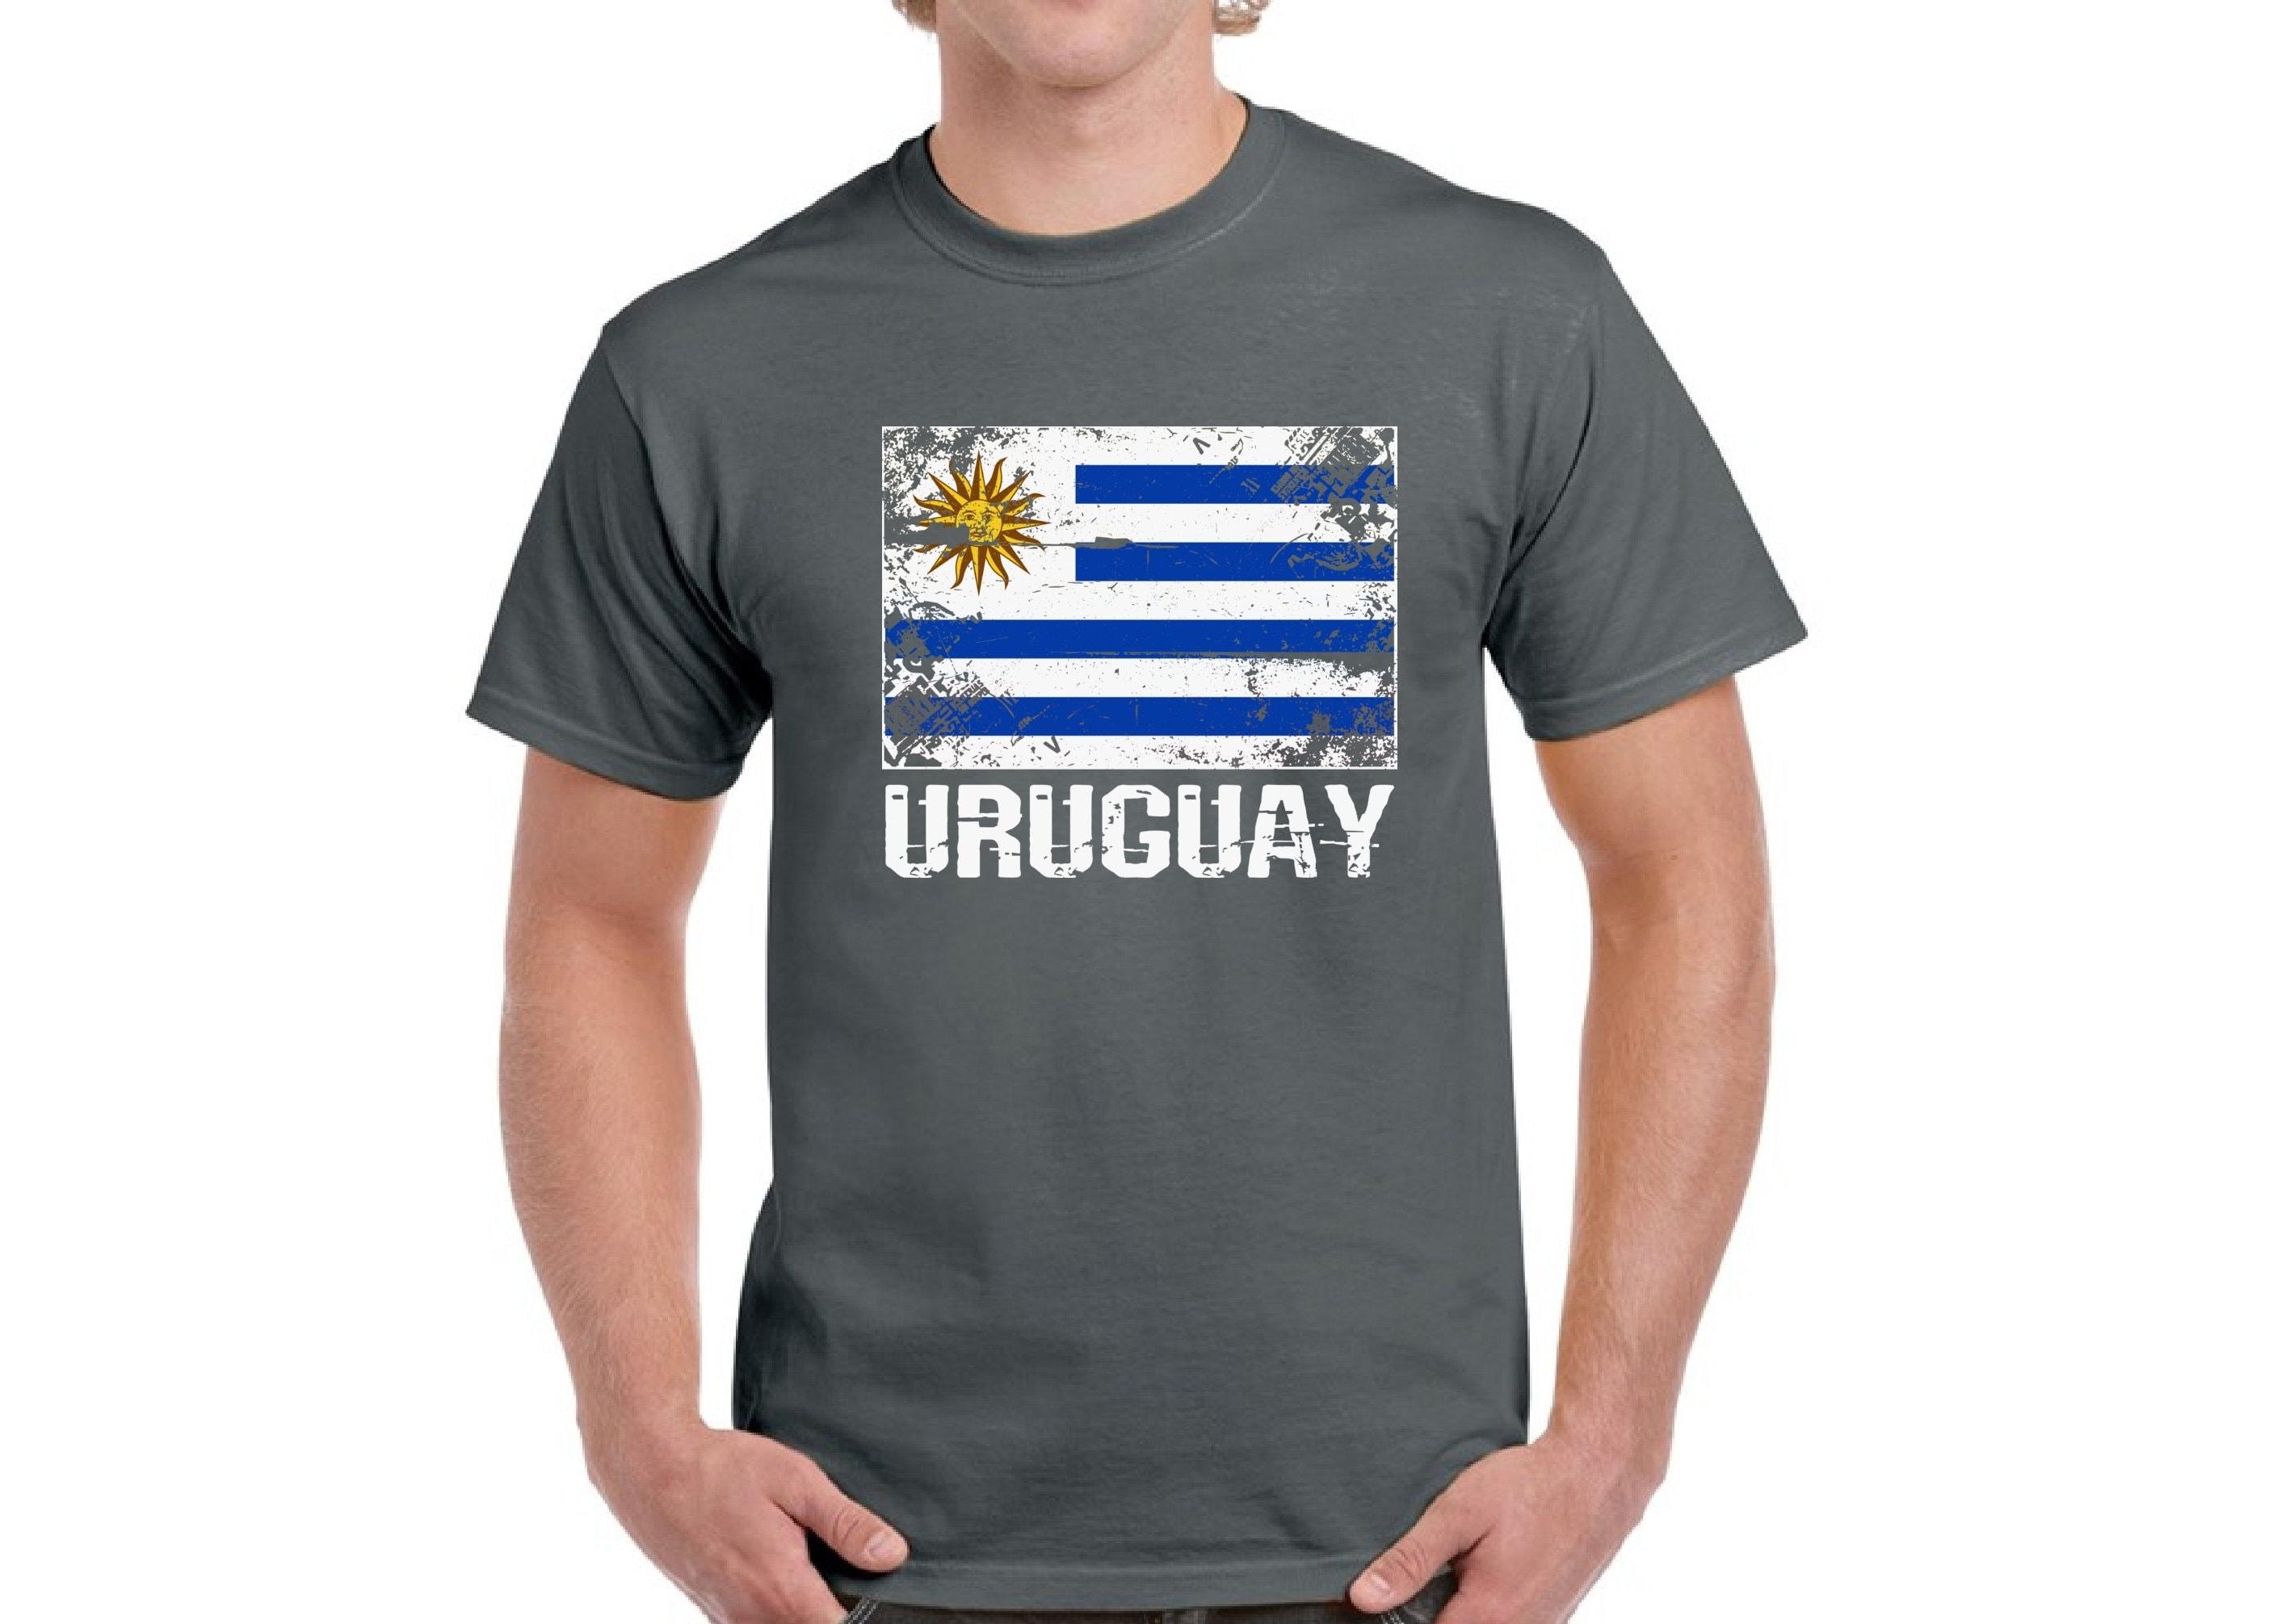 Uruguay Shirt For Men Uruguay Flag Shirt Uruguayan Soccer Shirts Uruguay 2018 T-shirt Gifts From Uruguay Uruguayan Mens Shirt Uruguay Gifts LongSleeve Tee